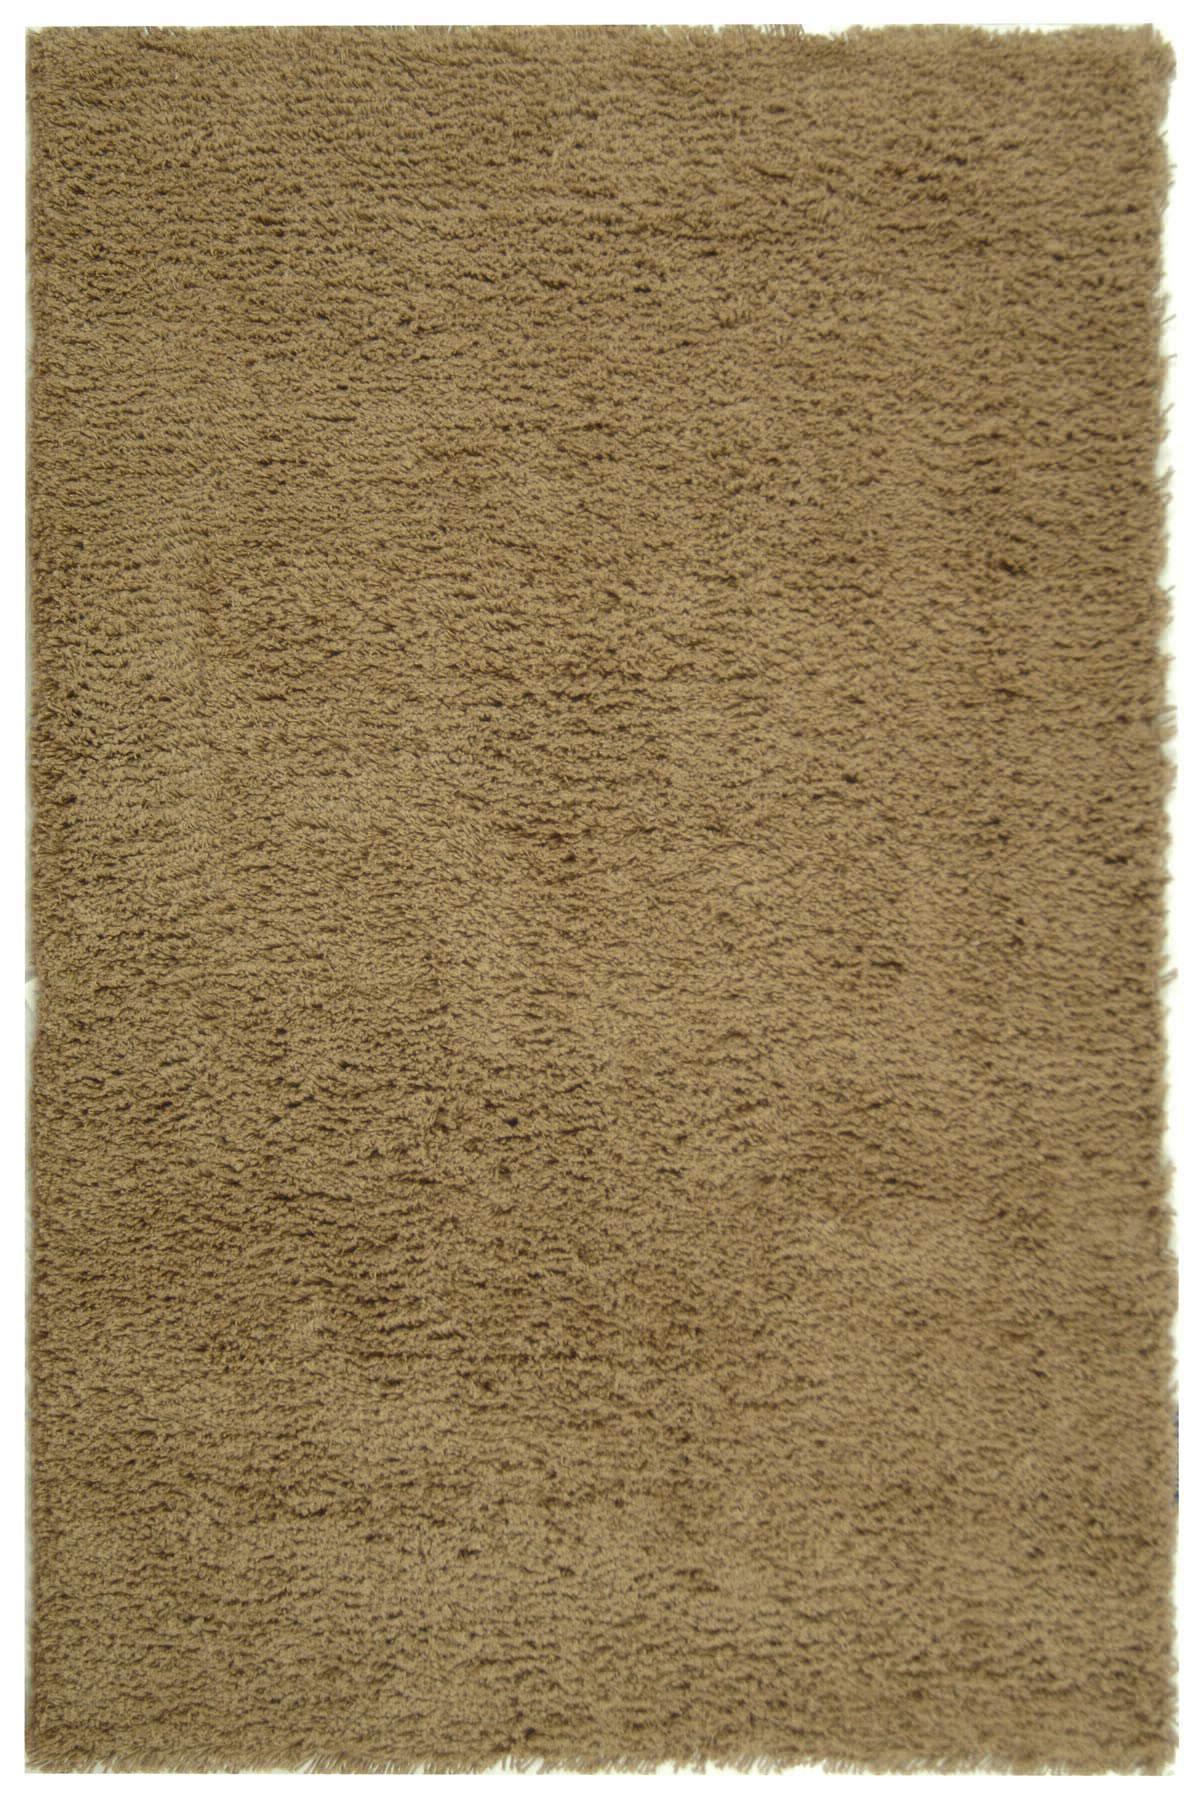 safavieh shag sg140d taupe area rug clearance 50266. Black Bedroom Furniture Sets. Home Design Ideas